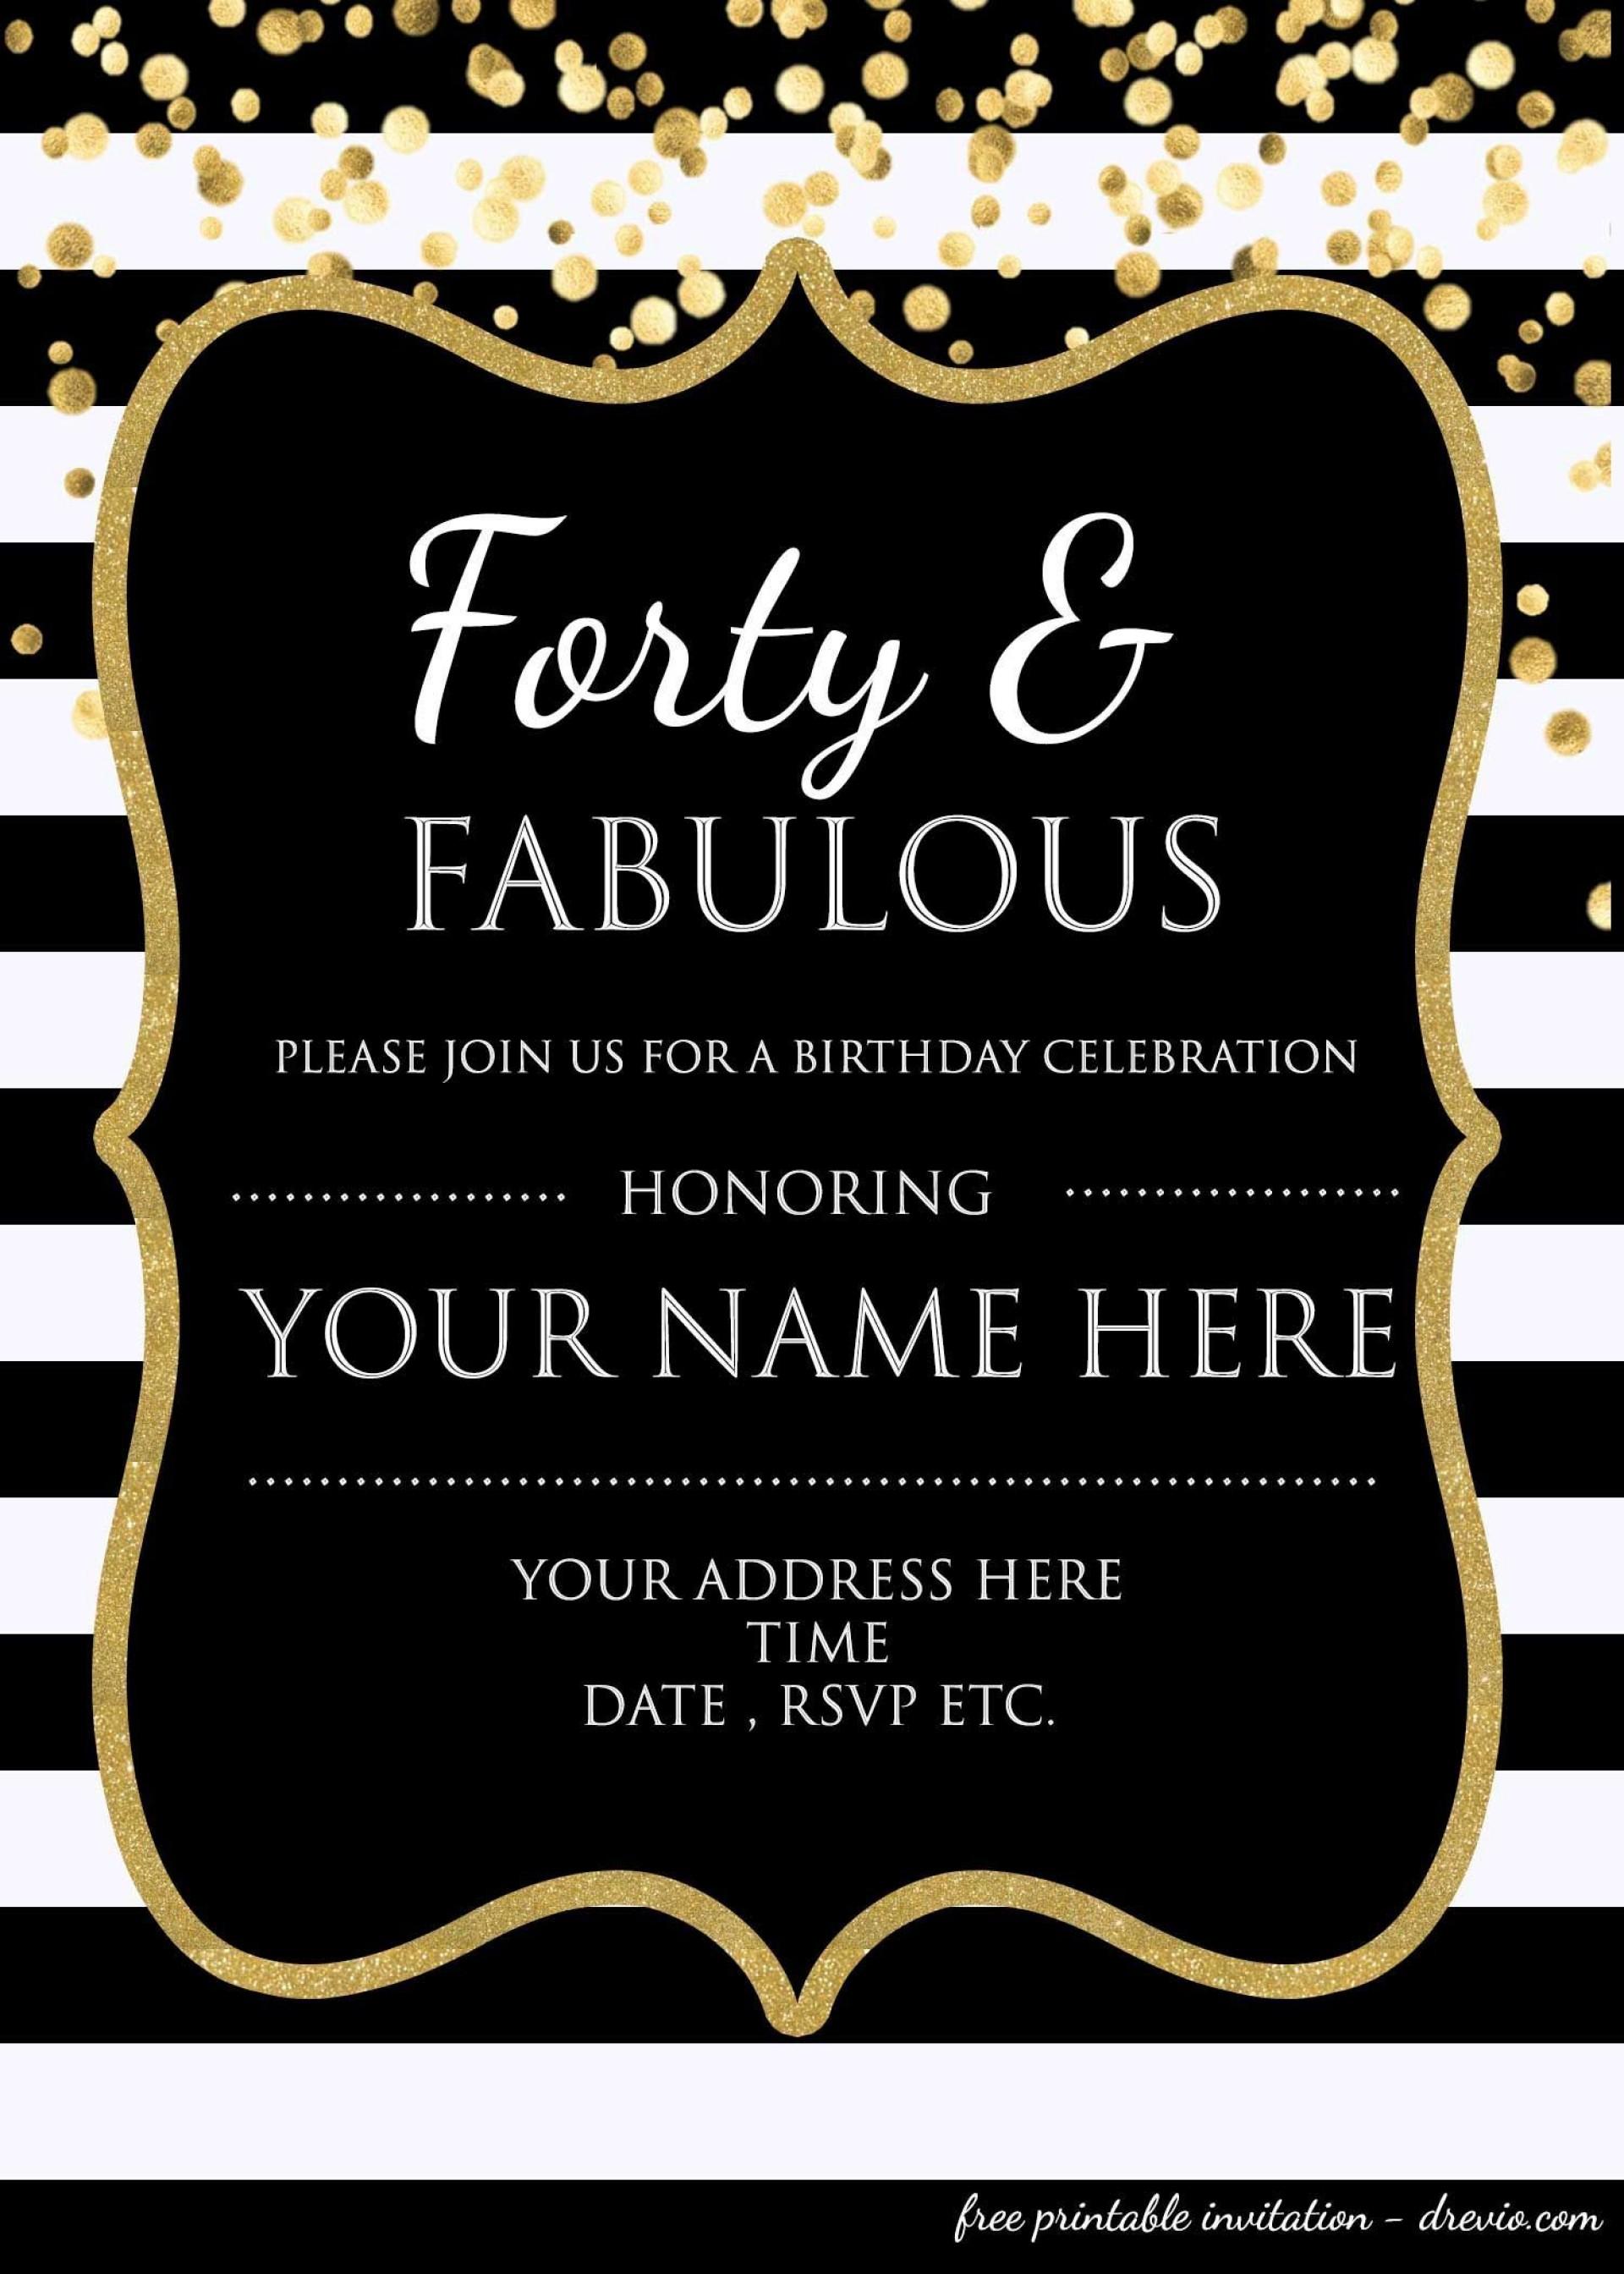 007 Impressive 40th Birthday Party Invite Template Free Inspiration 1920